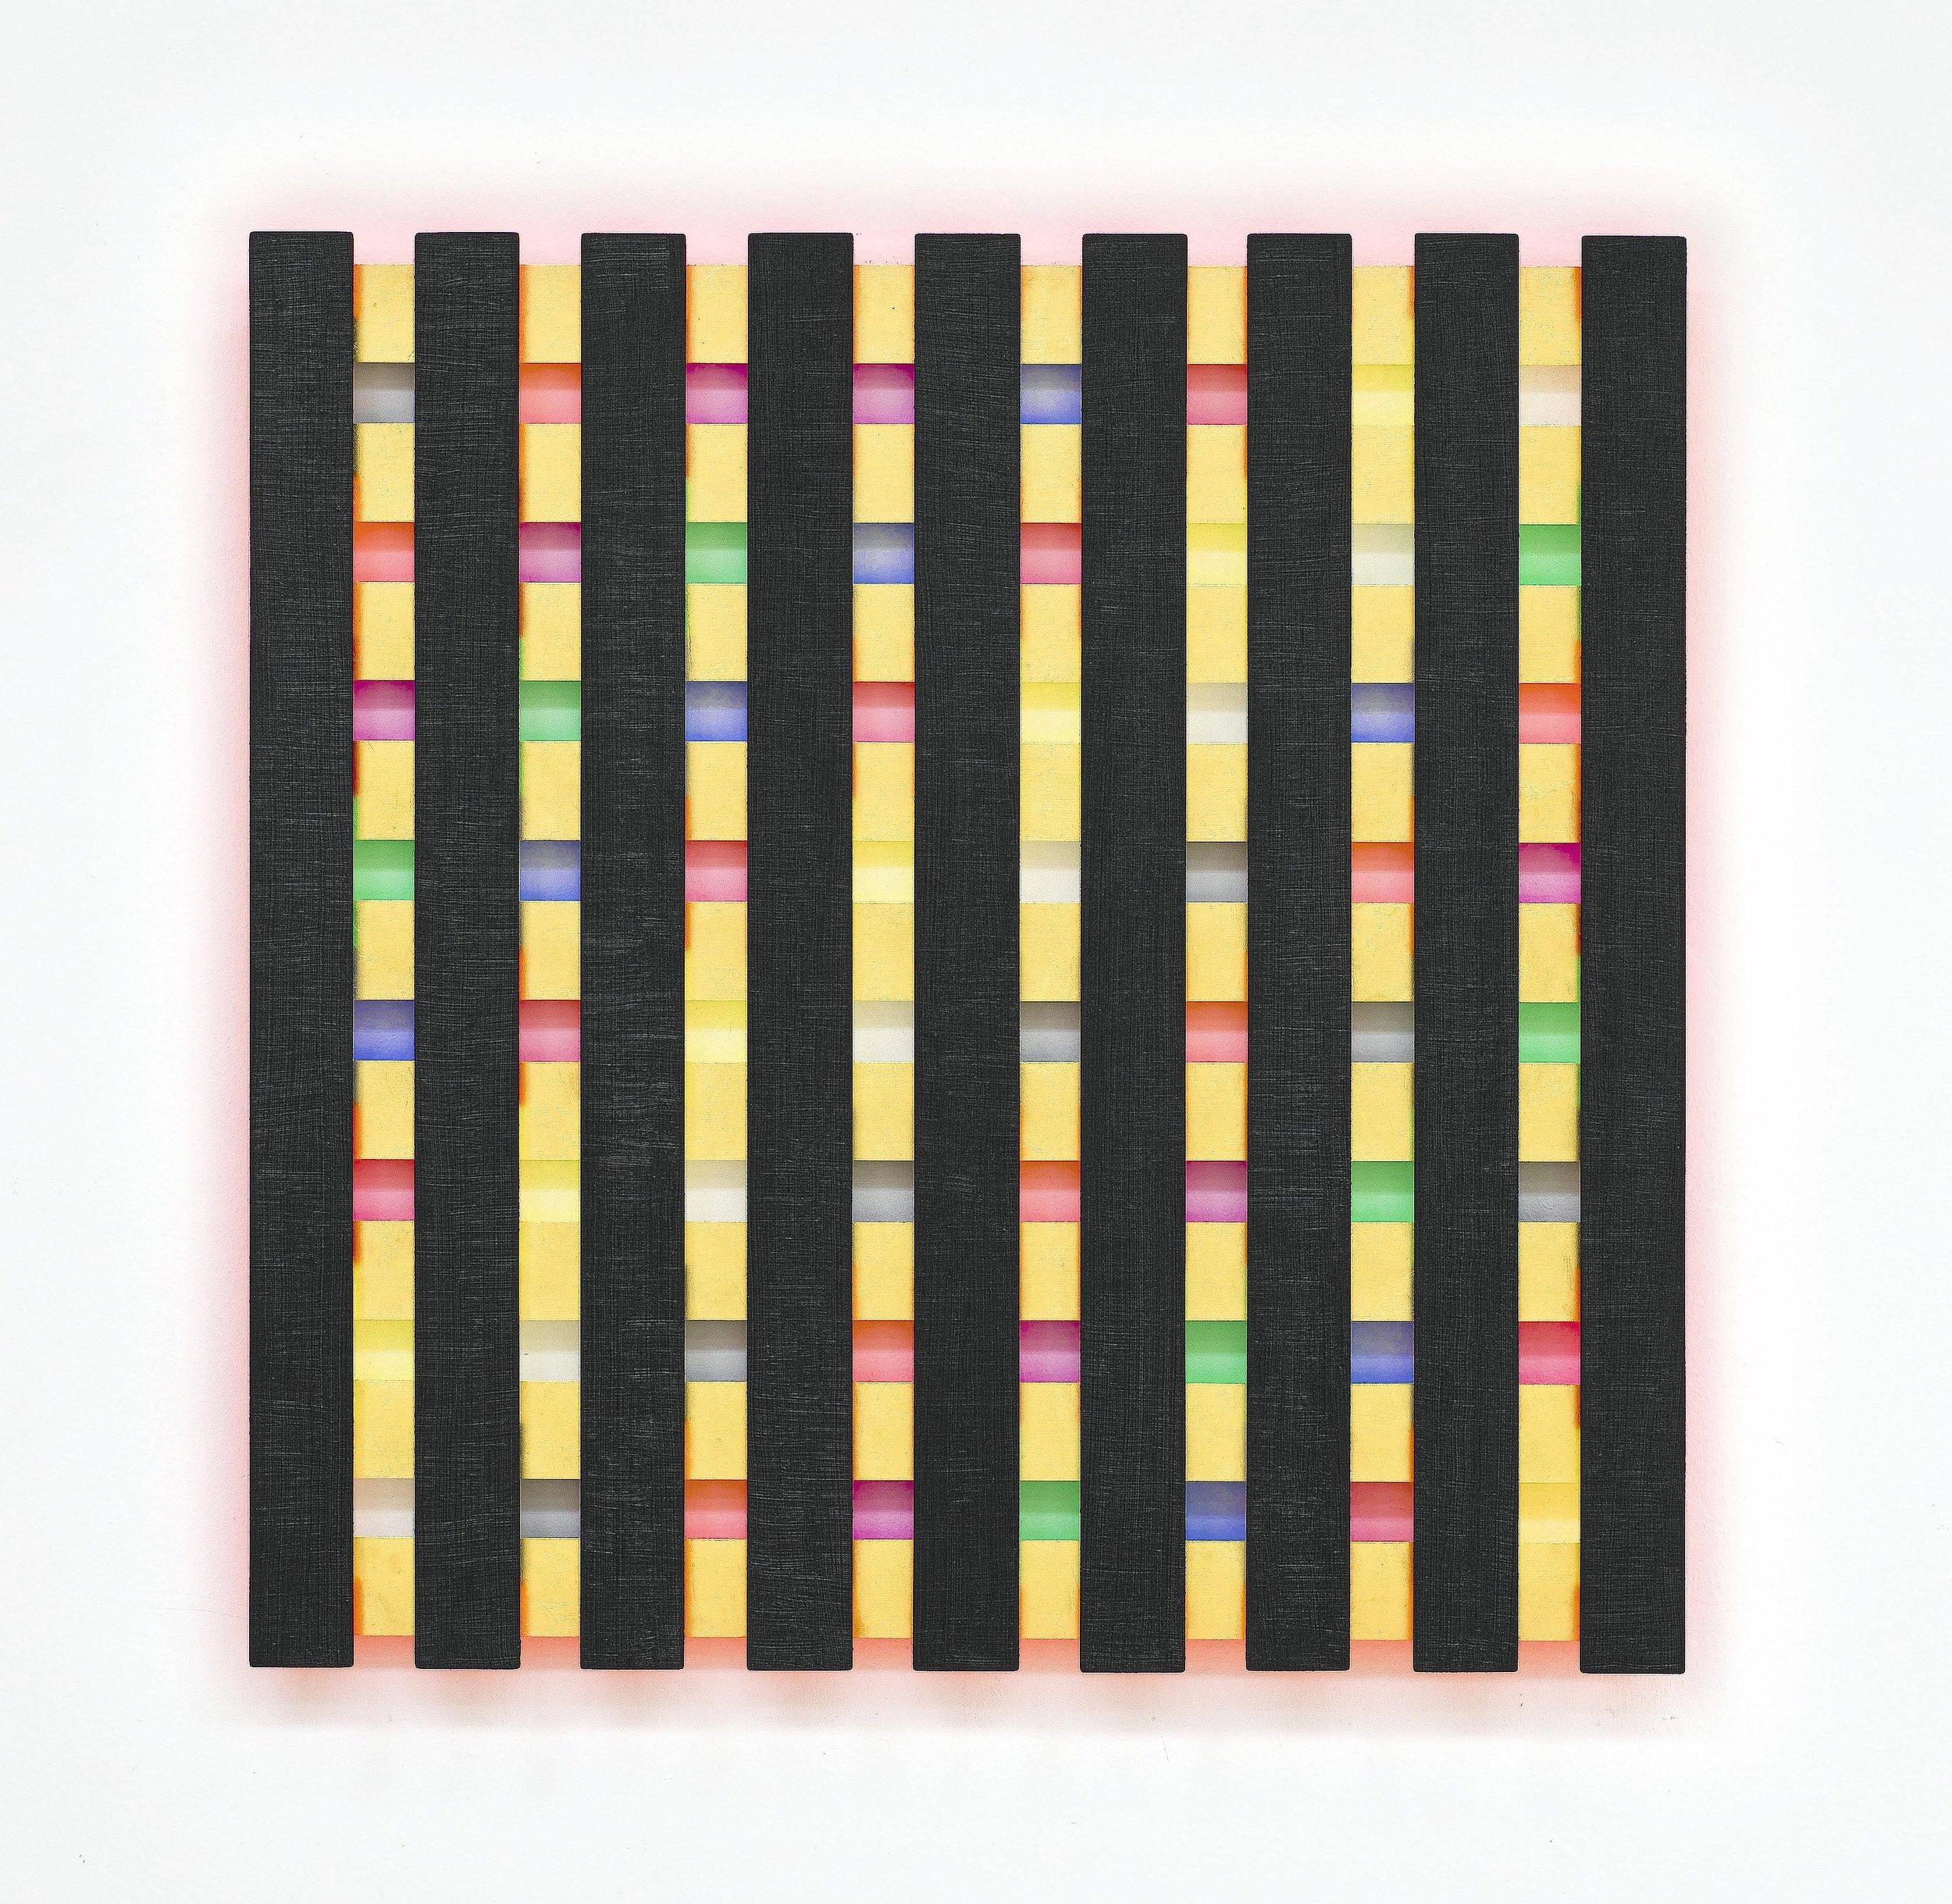 2j akril, les, 121 x 121 cm, 2009.jpg